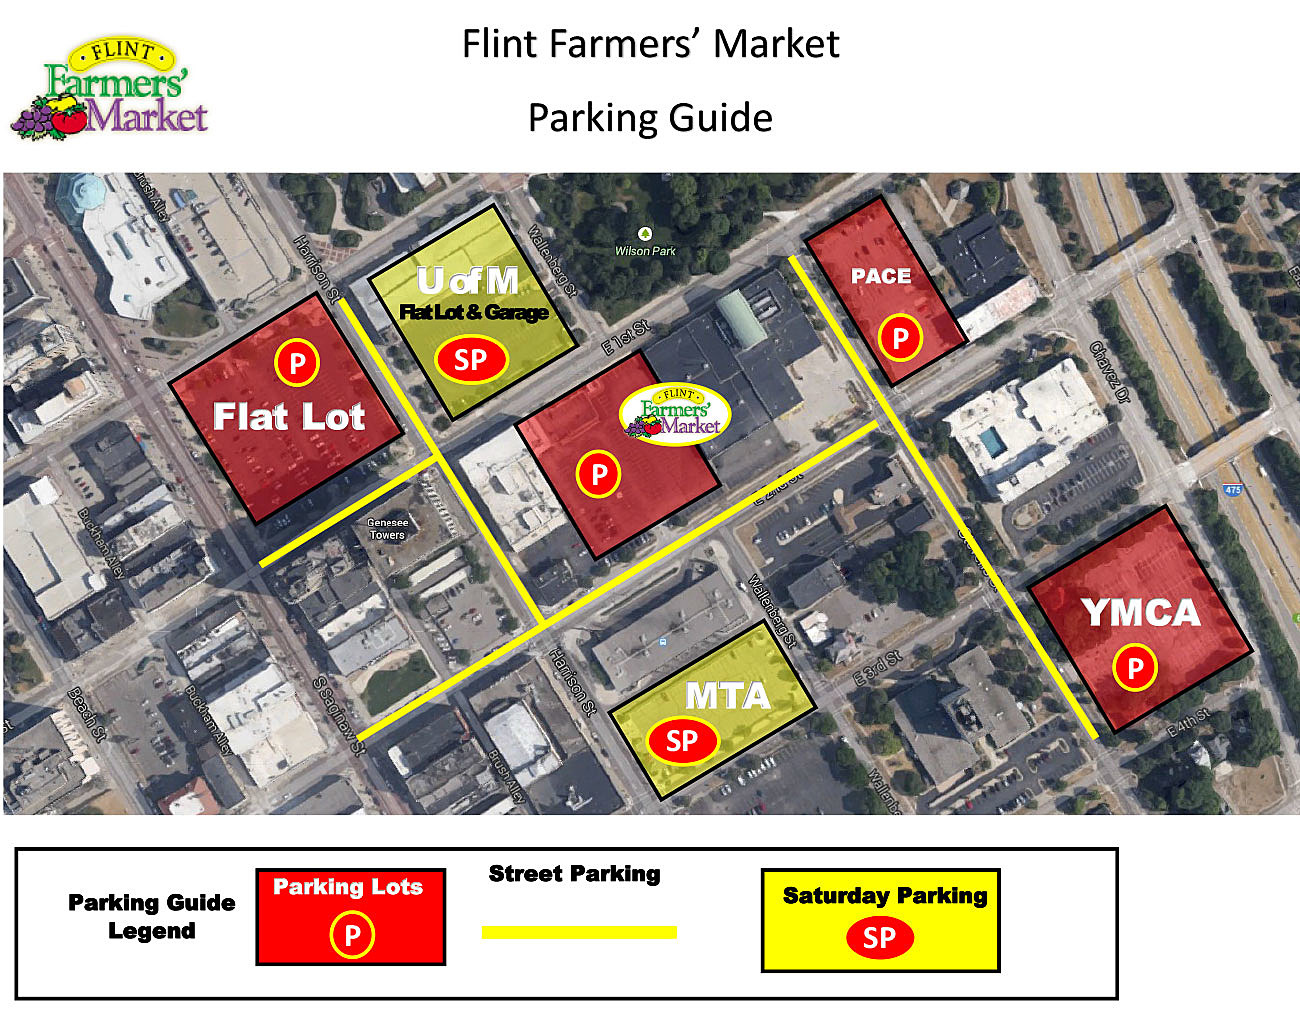 Flintfarmersmarket.com